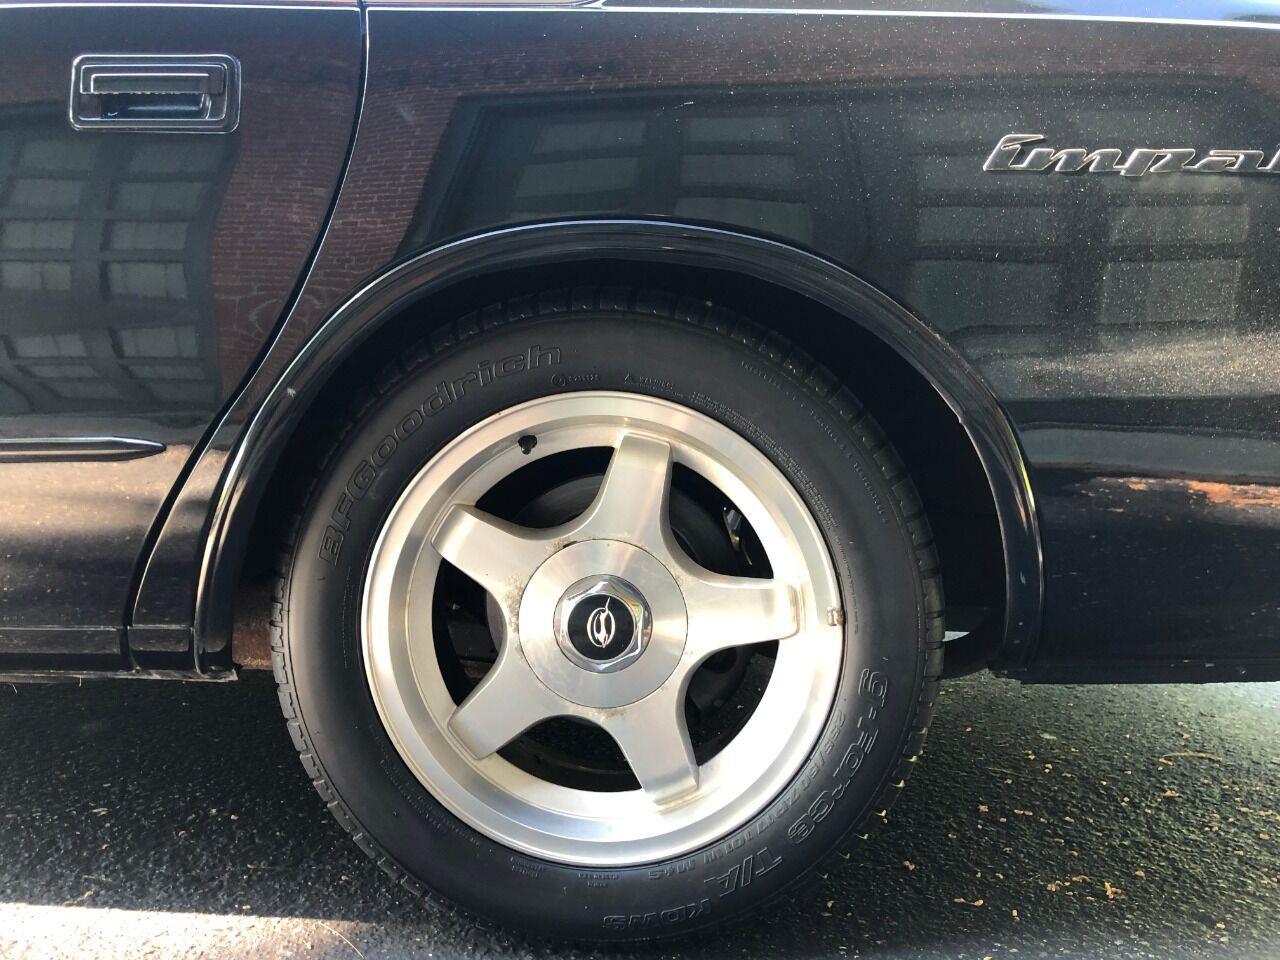 1996 Chevrolet Impala (CC-1360246) for sale in Washington, Michigan